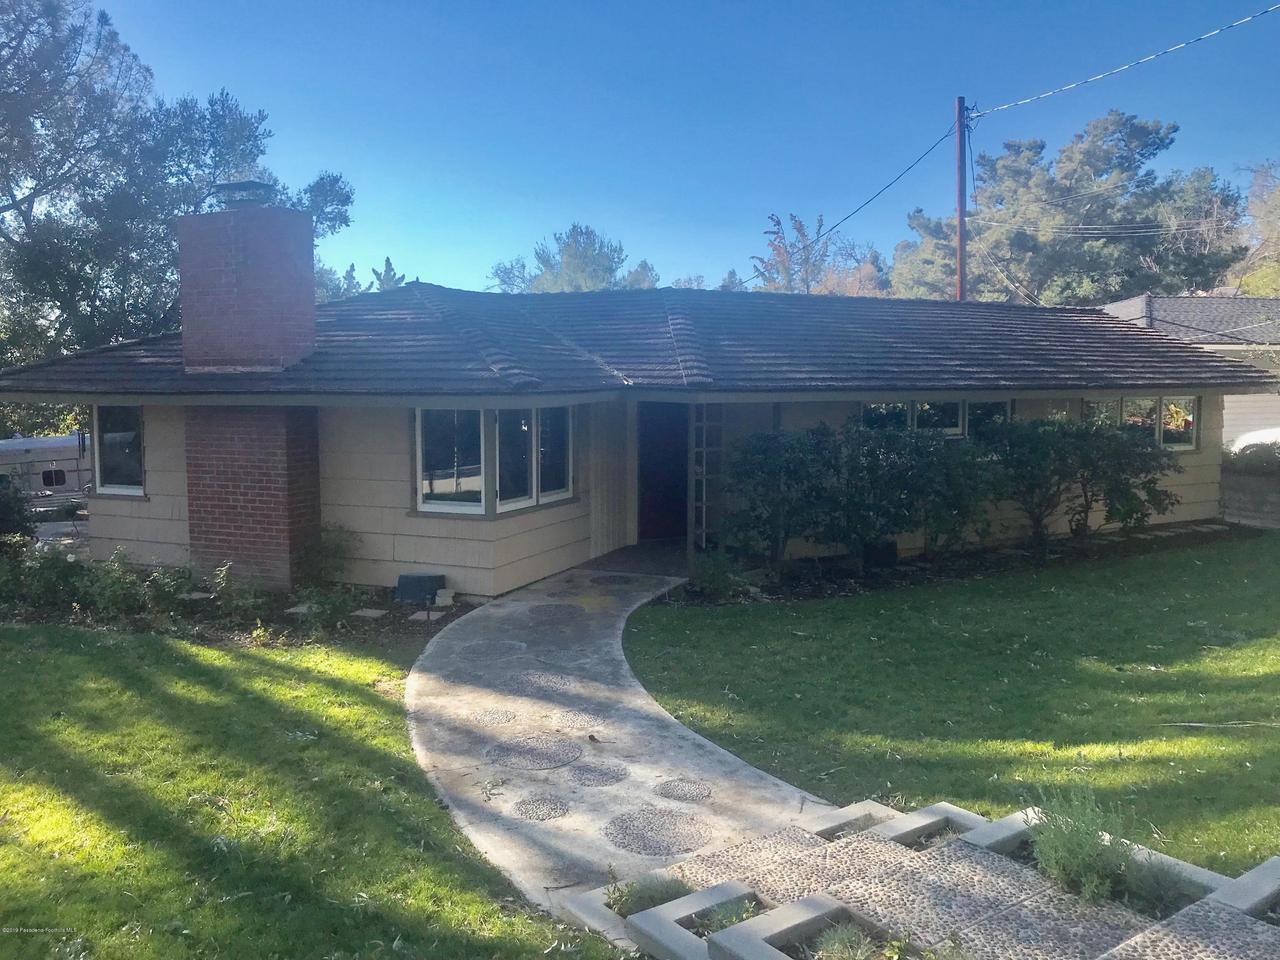 1976 LOMA ALTA, Altadena, CA 91001 - IMG-4983